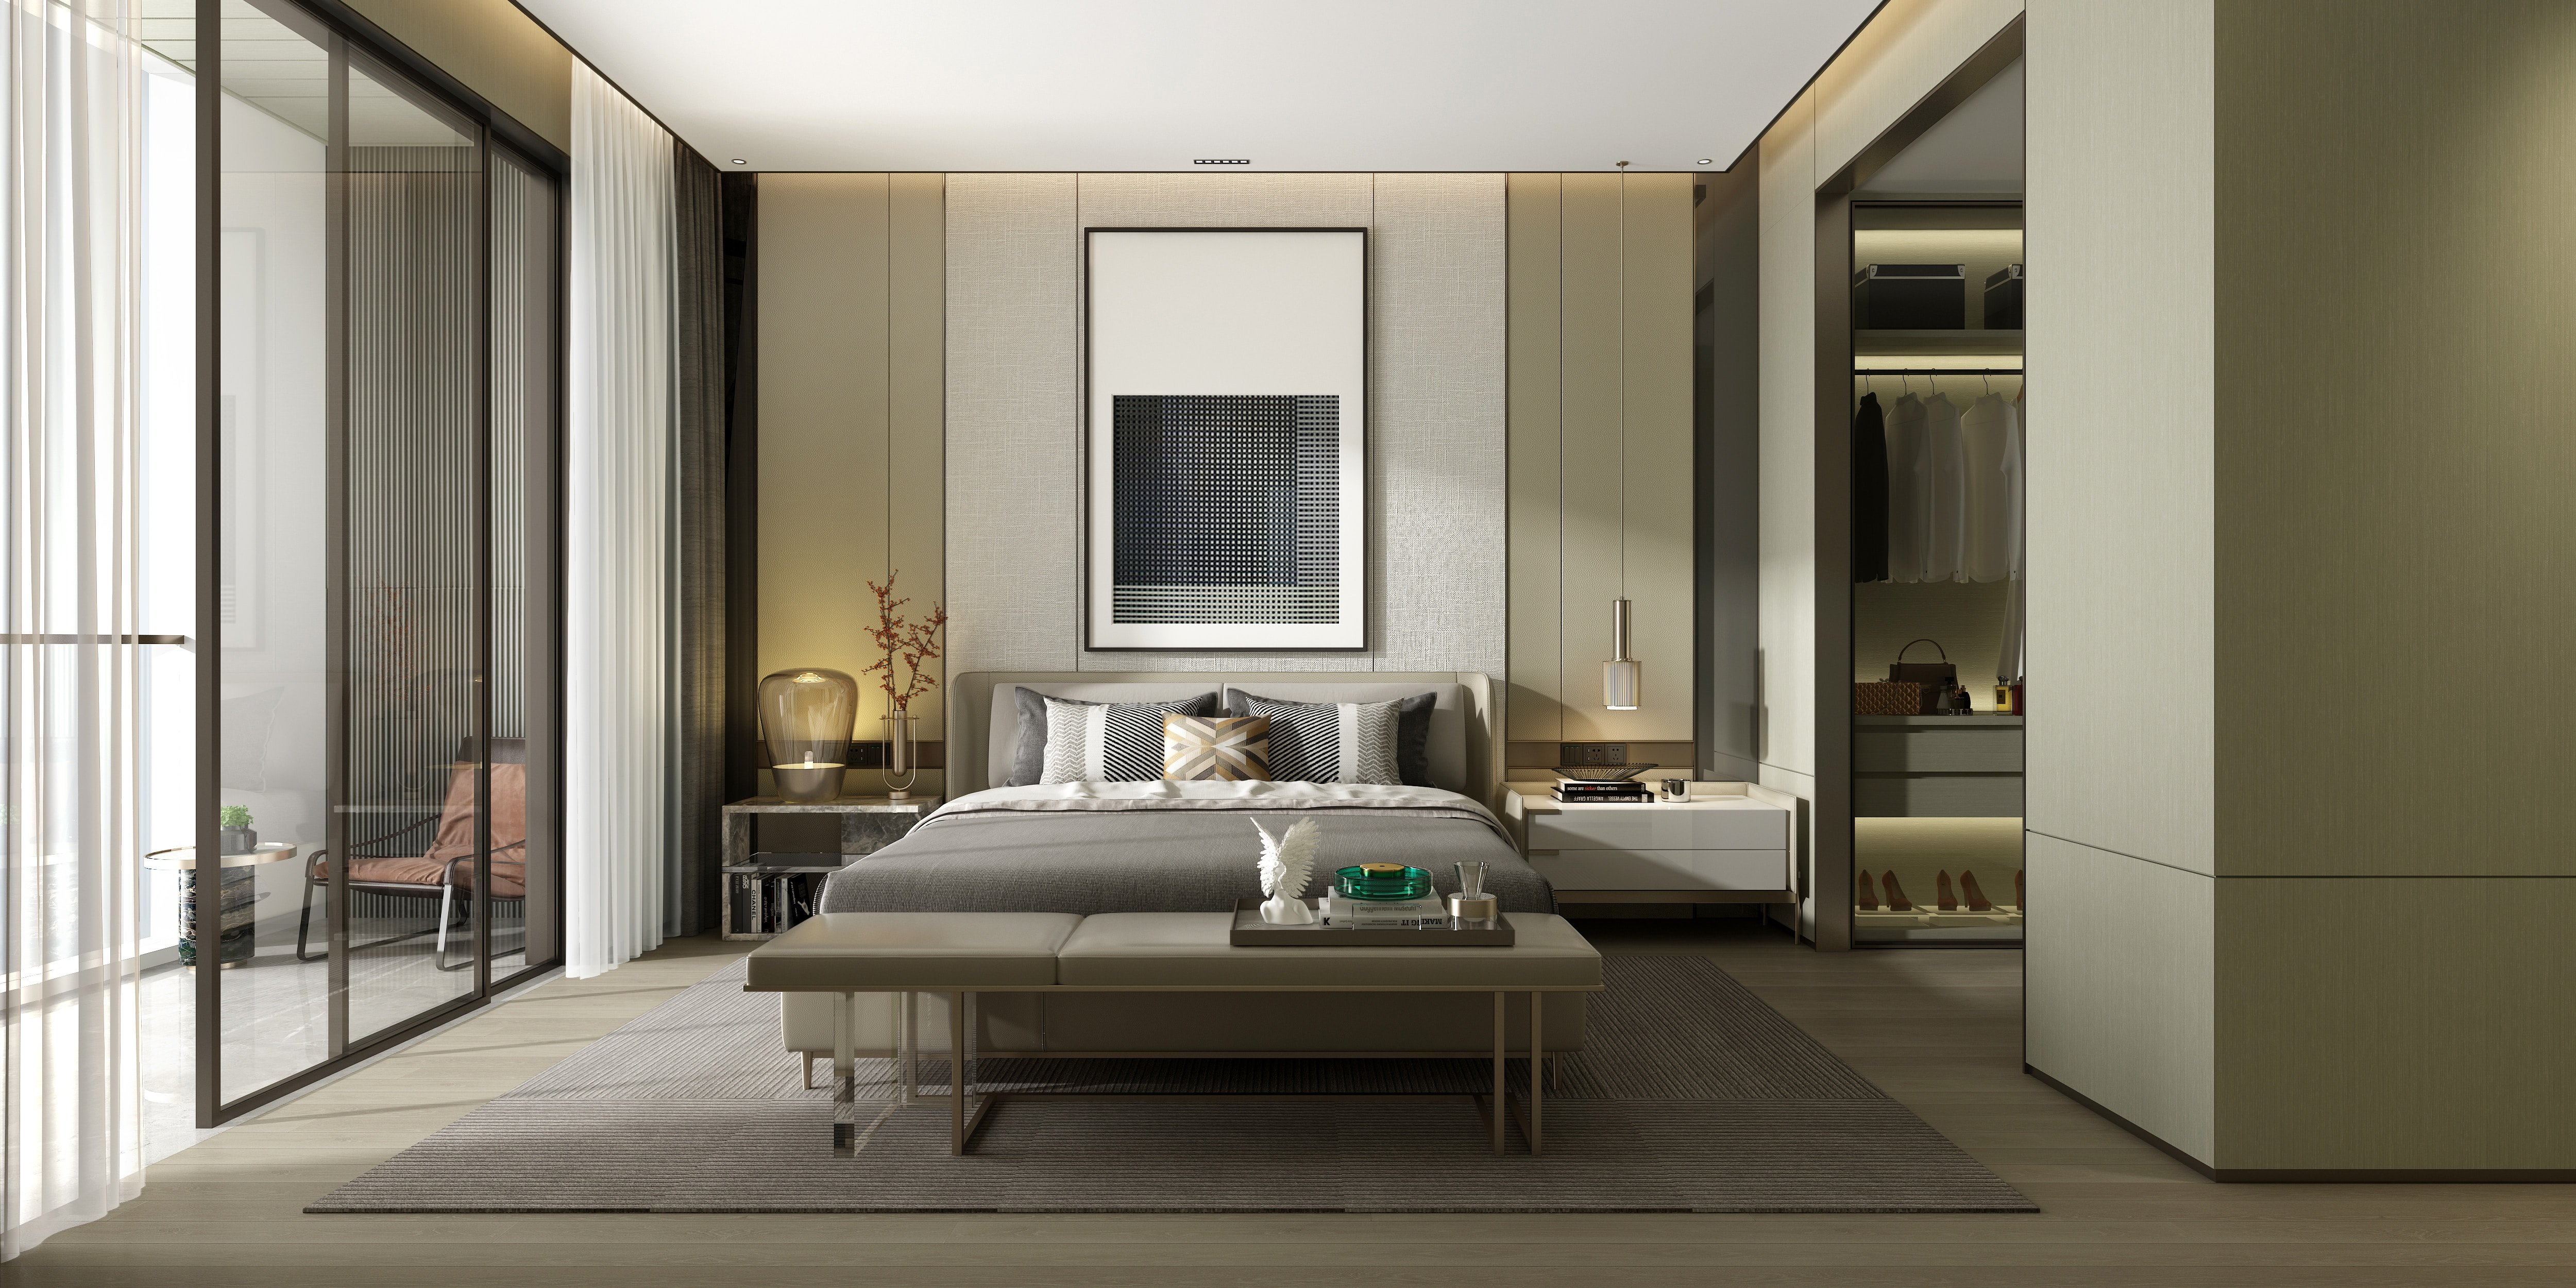 8 Calming Bedroom Lighting Ideas That'll Help You Sleep Better